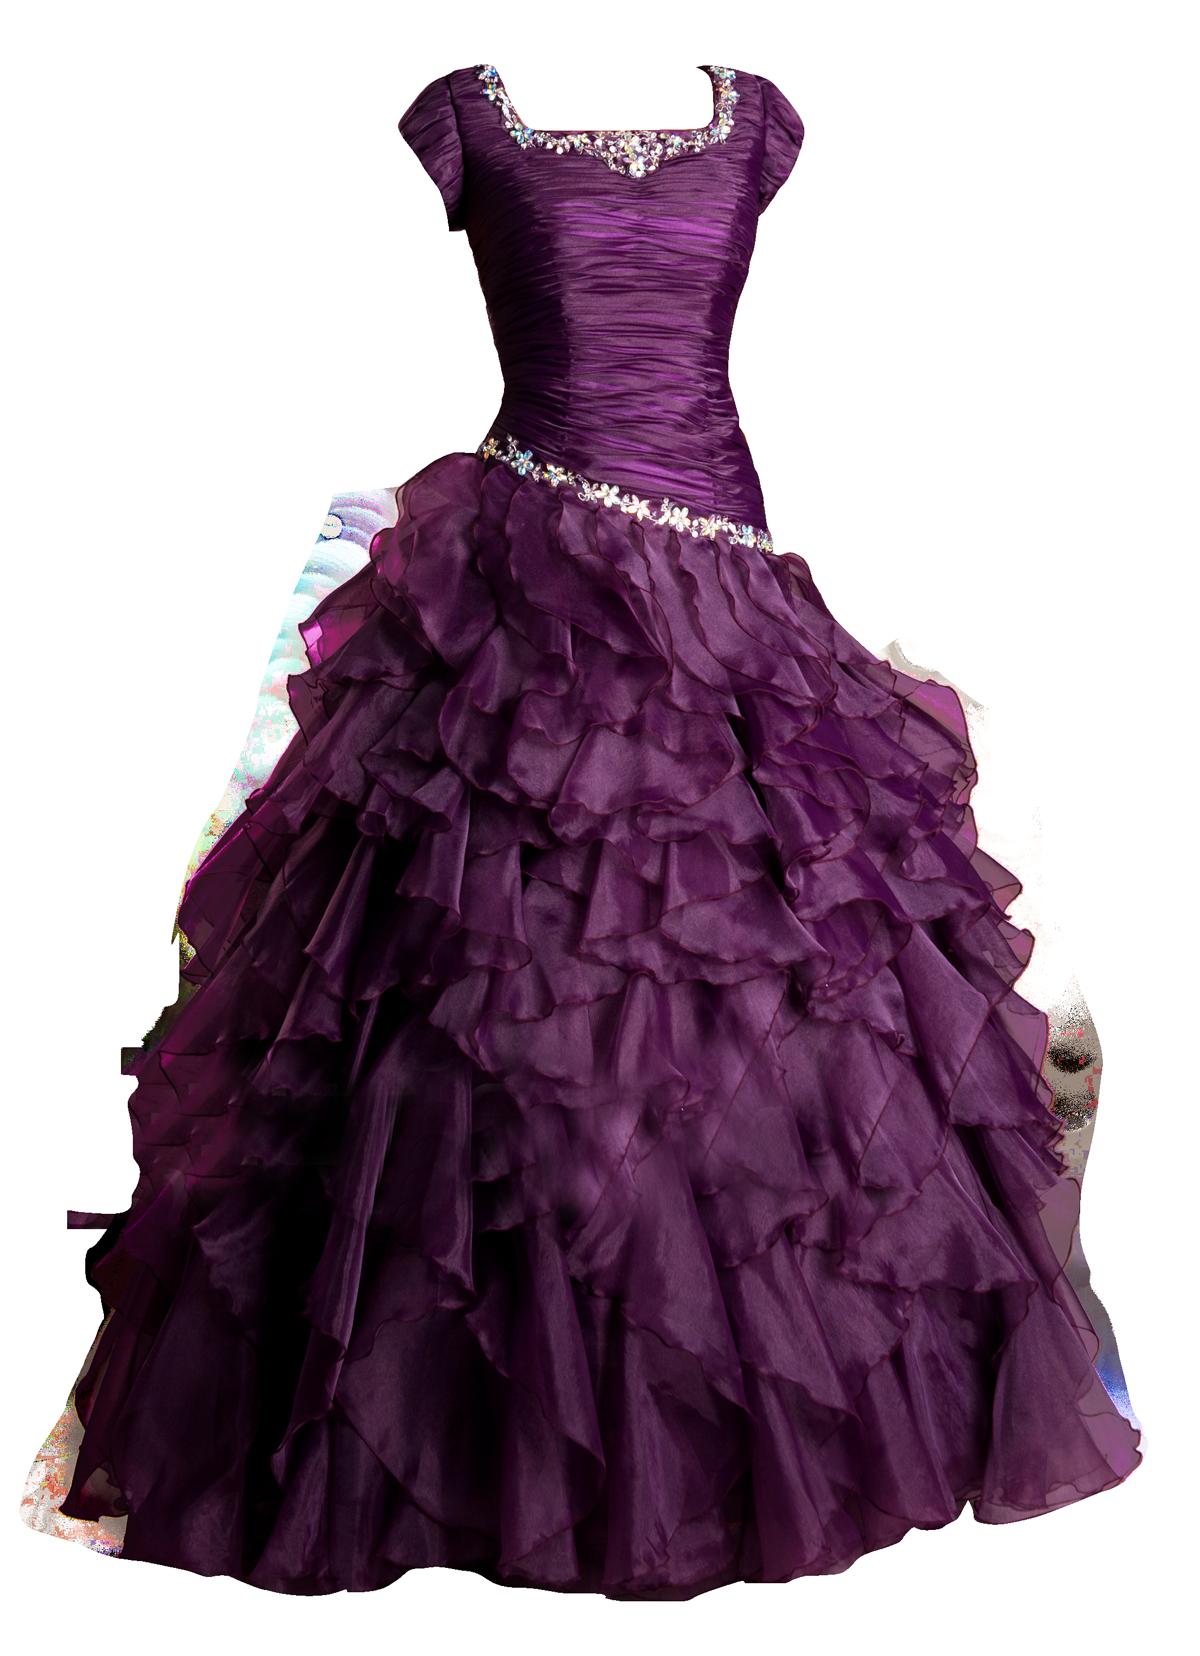 Dress clipart cocktail dress. Girl png image purepng